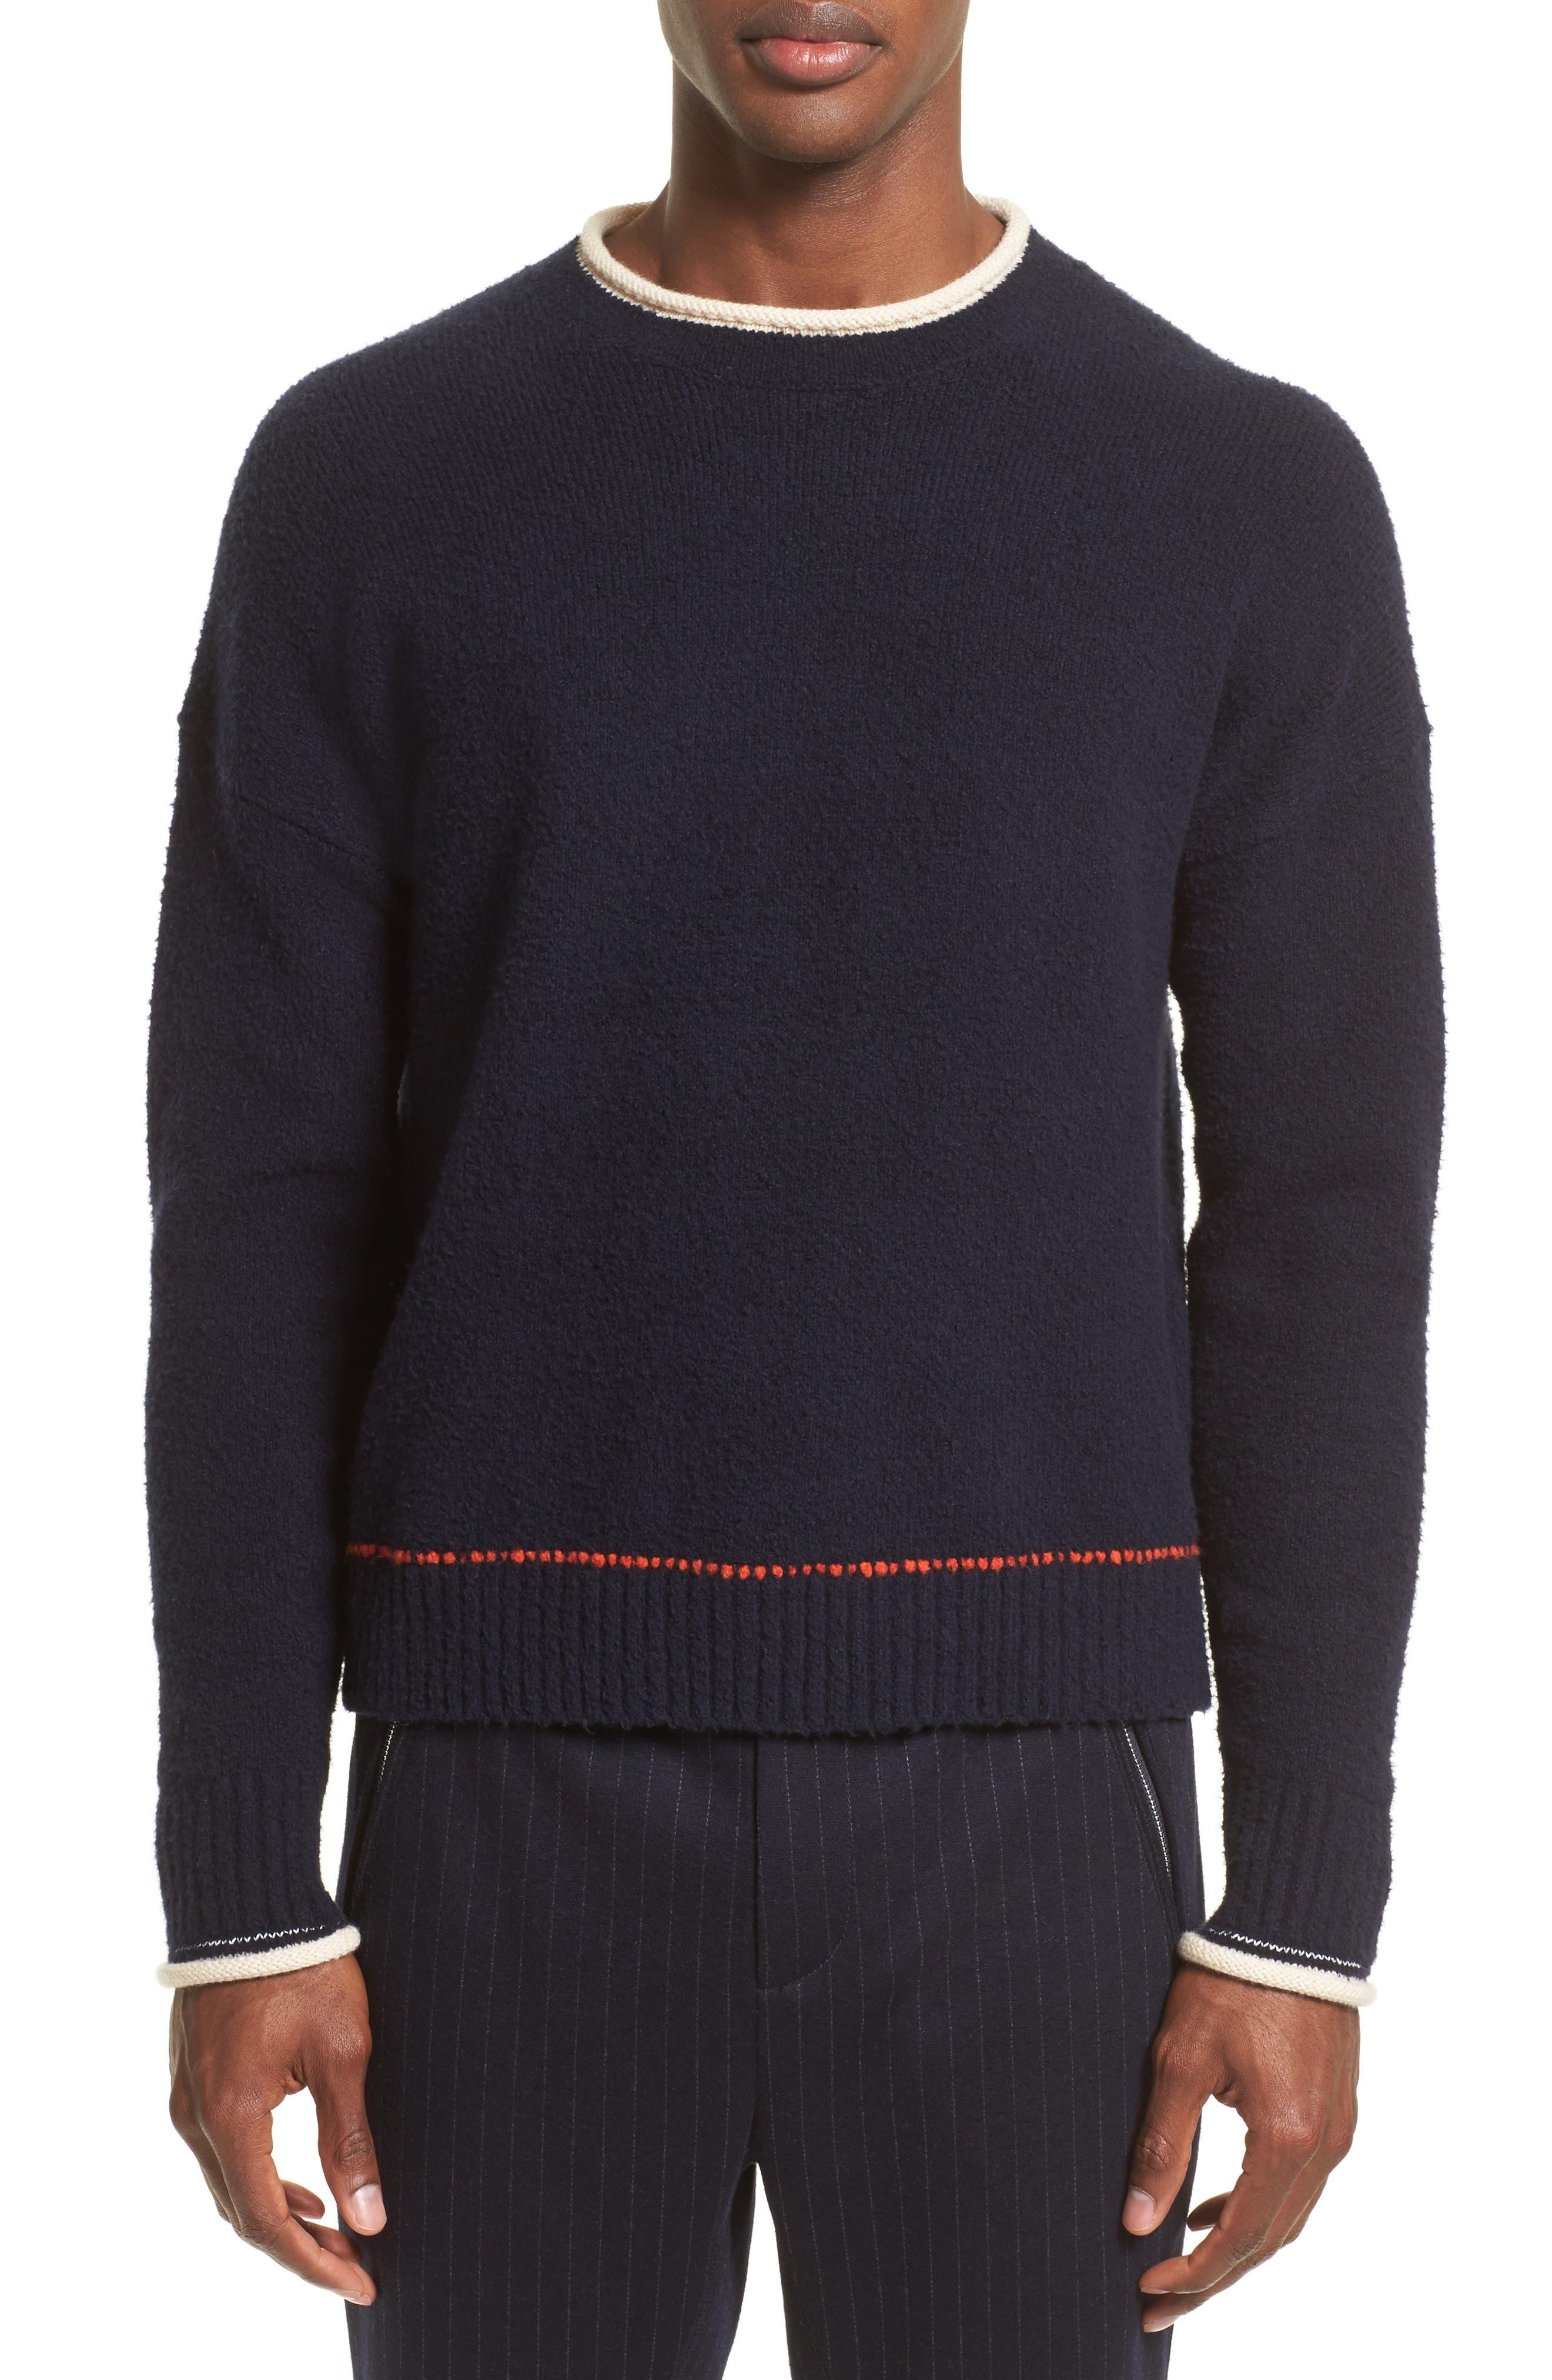 Alternate Image 1 Selected - 3.1 Phillip Lim Plaited Sweater